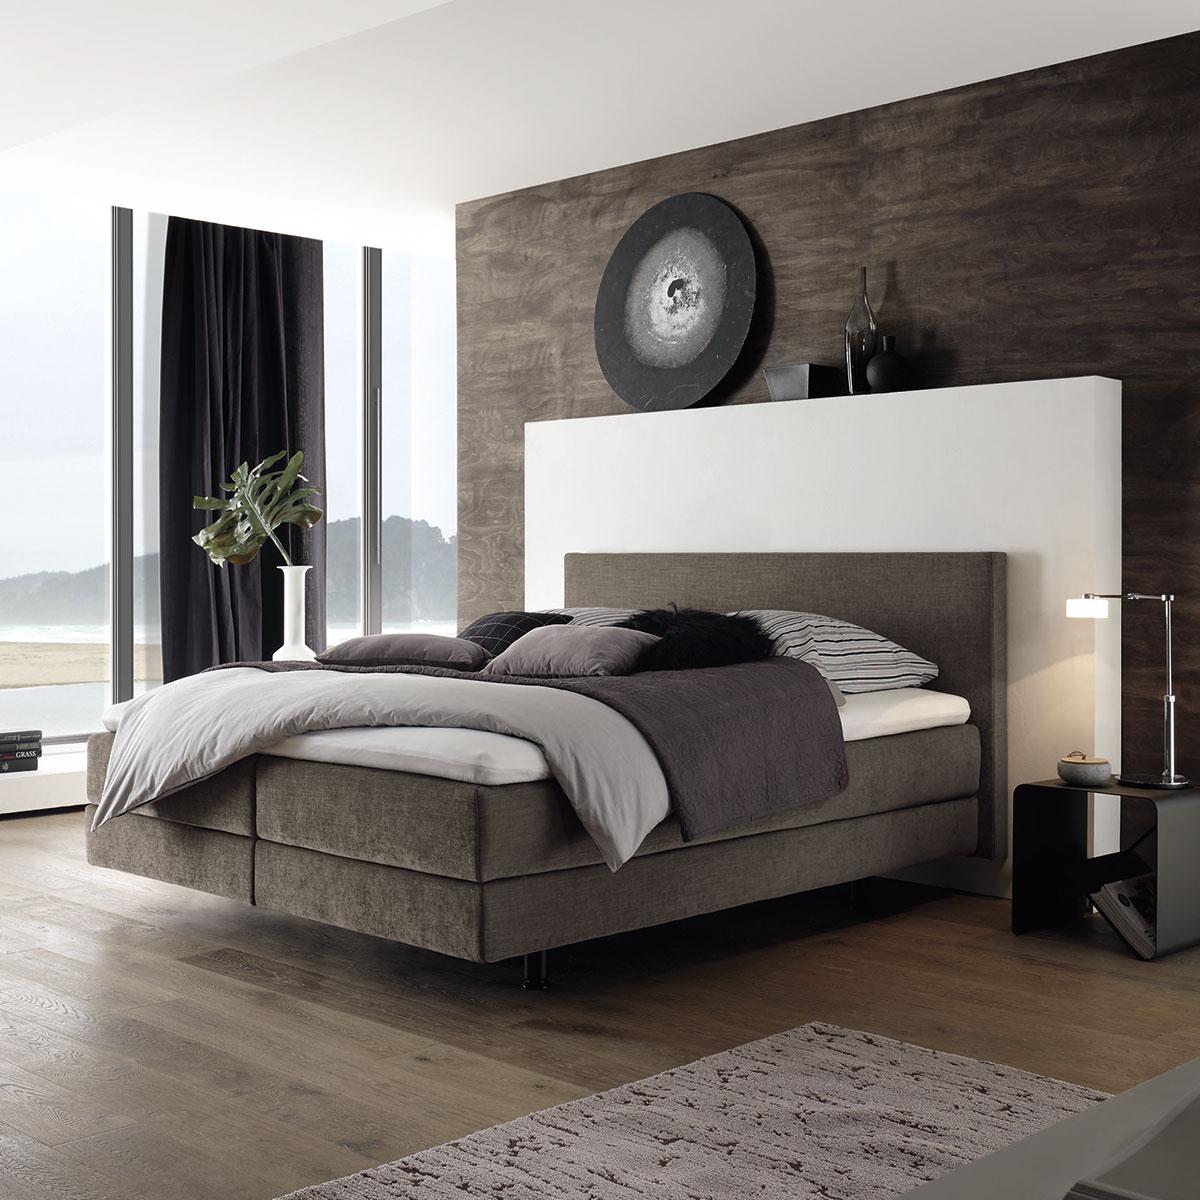 boxspringbett von h lsta in braun ca 180x200 cm flamme. Black Bedroom Furniture Sets. Home Design Ideas